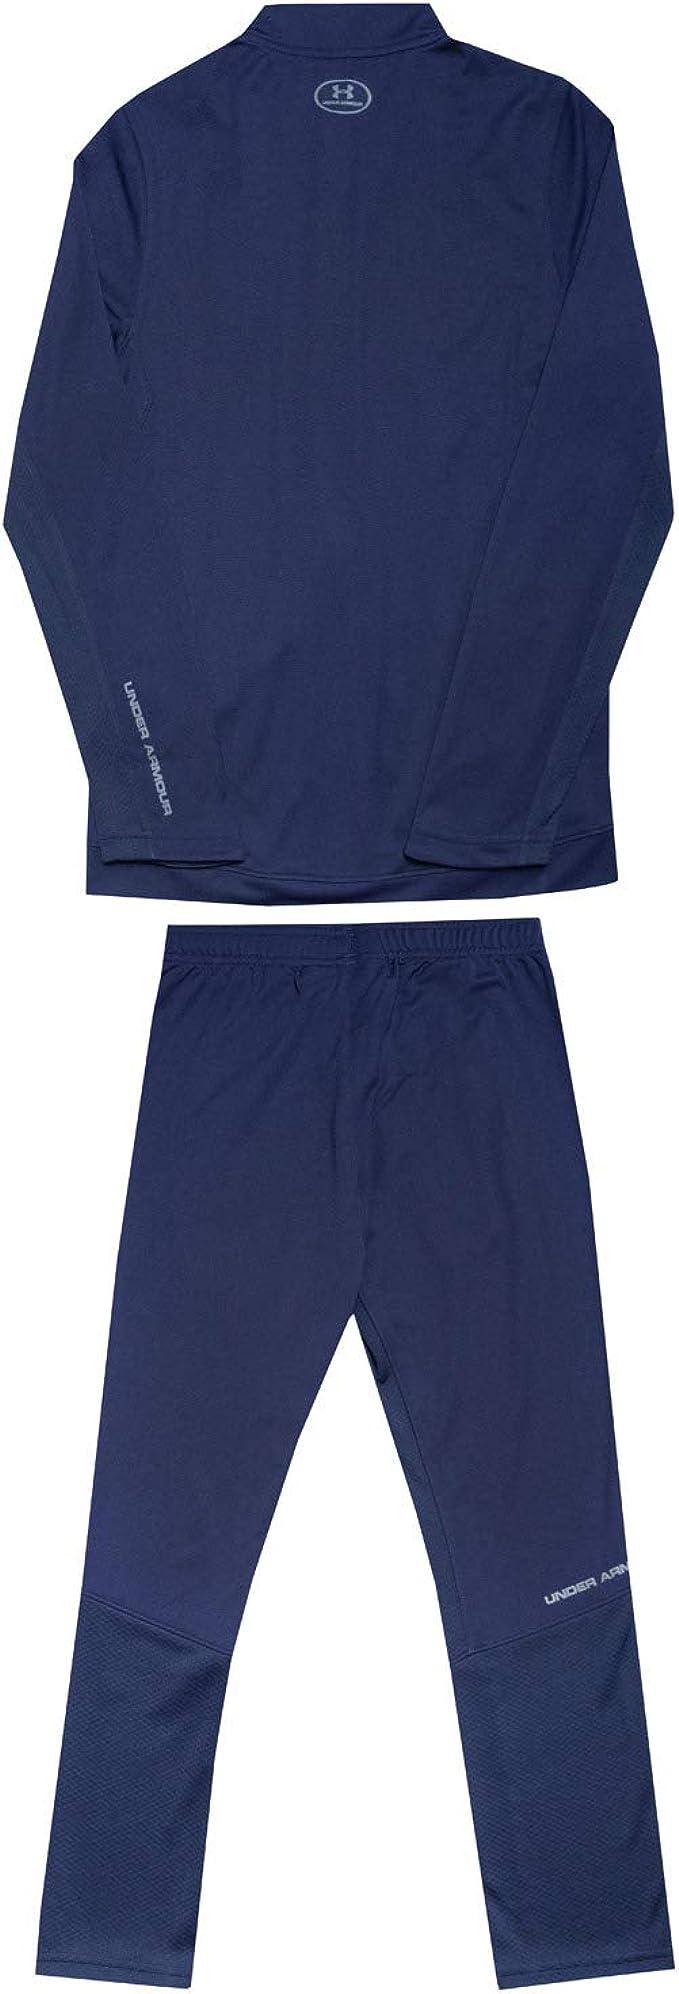 Under Armour Jungen Knit Anzug Trainingsanzug